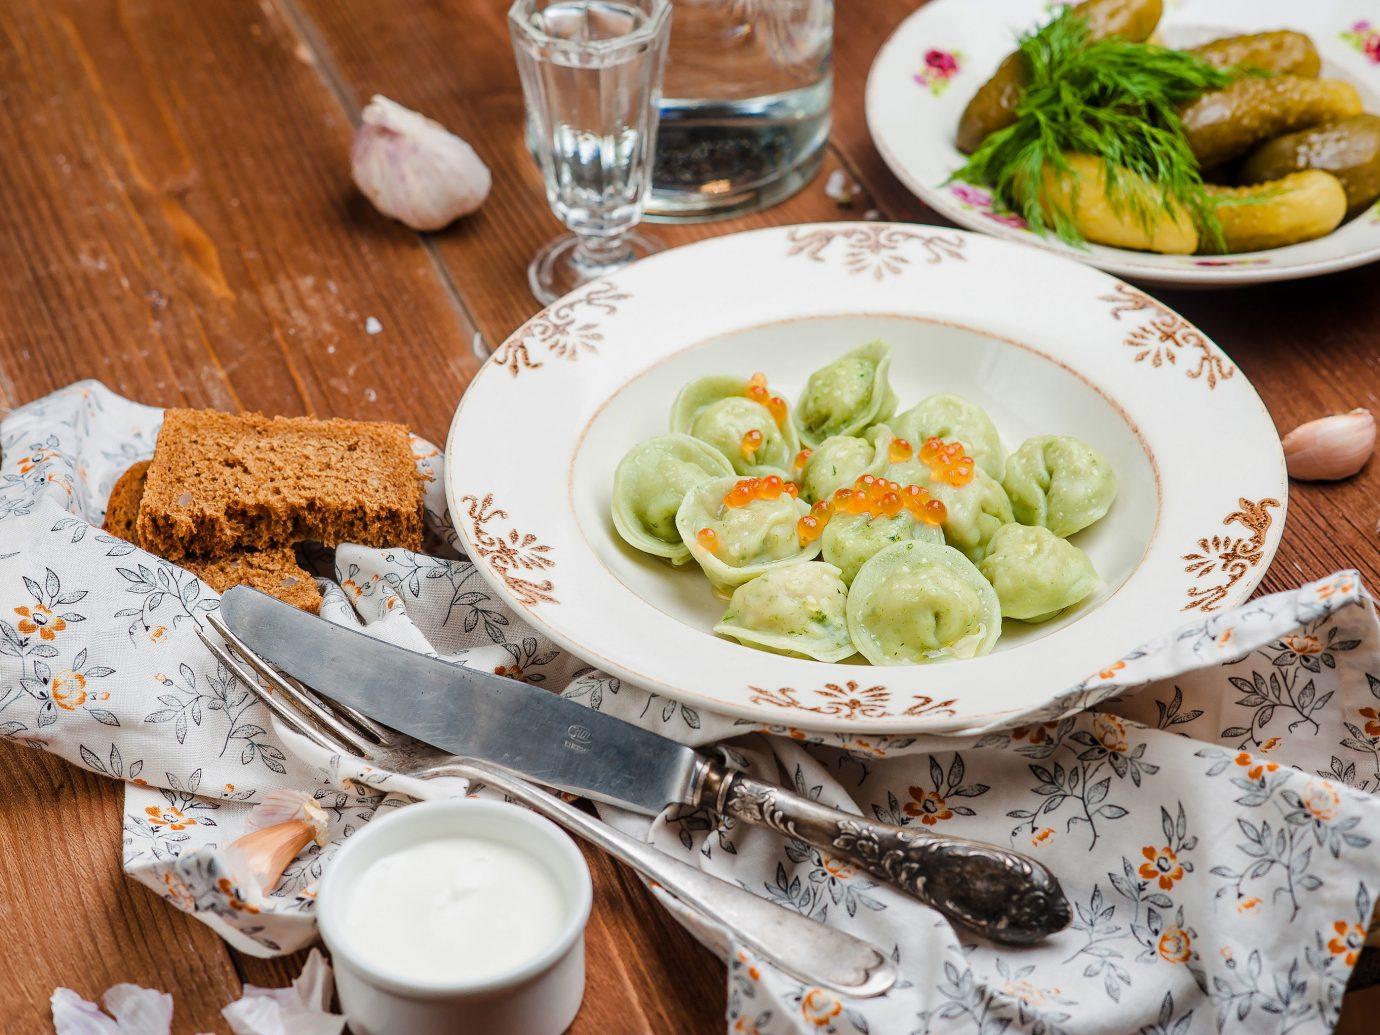 Arts + Culture Hotels Jetsetter Guides table plate food dish meal cuisine wooden vegetarian food breakfast brunch vegetable tableware recipe several